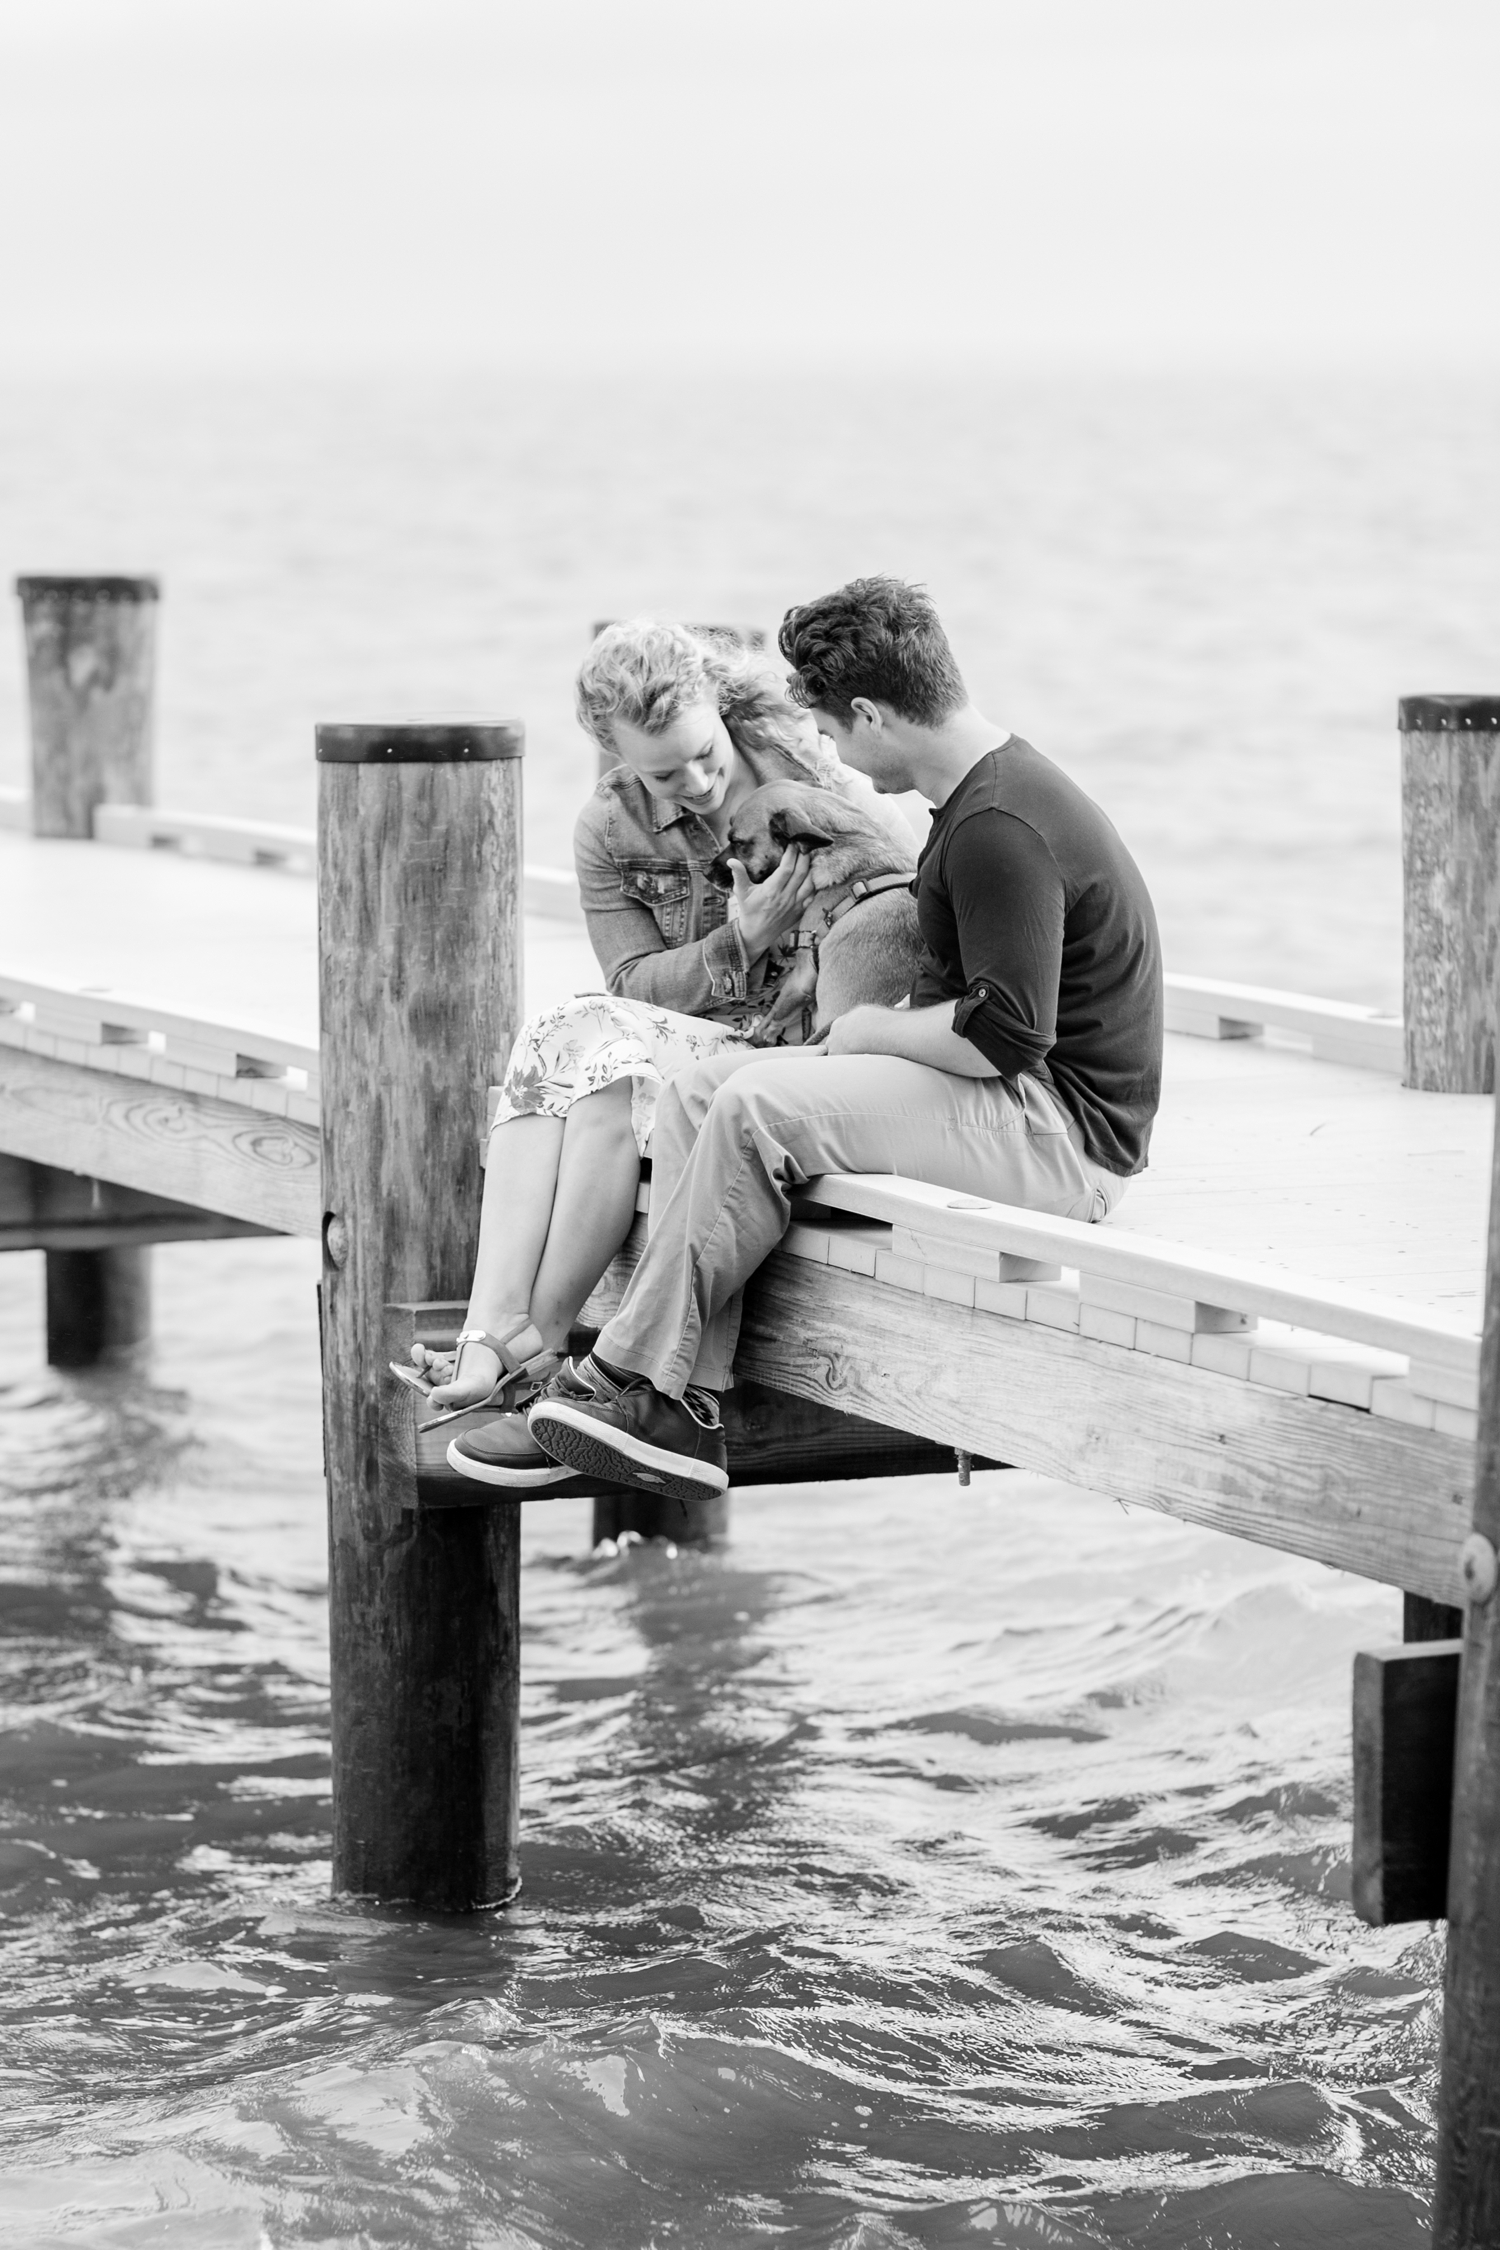 Kirsten & Dan Engagement-36_North-Point-State-Park-Engagement-Maryland-engagement-wedding-photographer-anna-grace-photography-photo.jpg